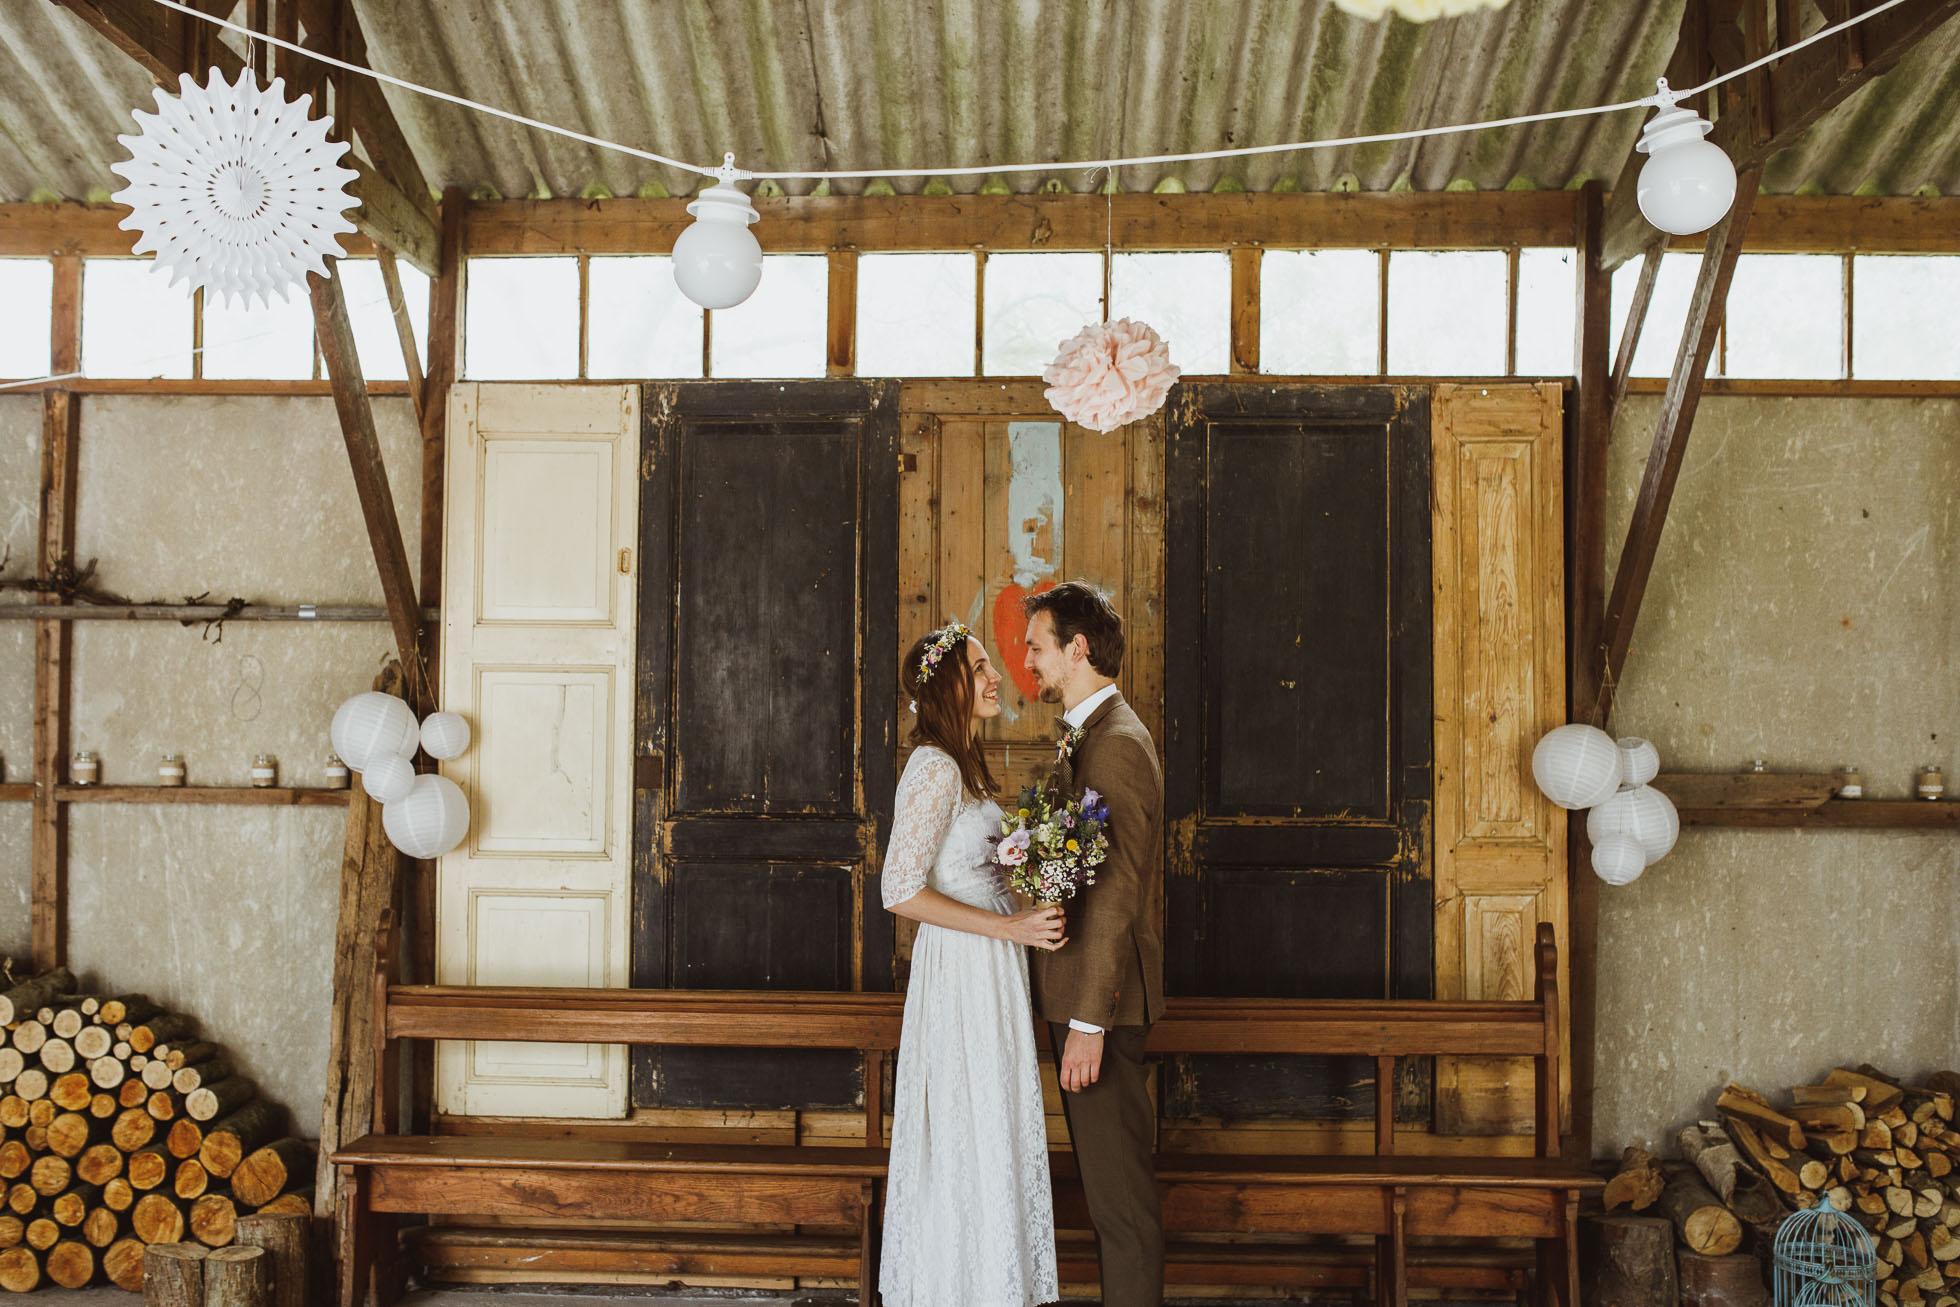 utrecht-wedding-photographer-47.jpg